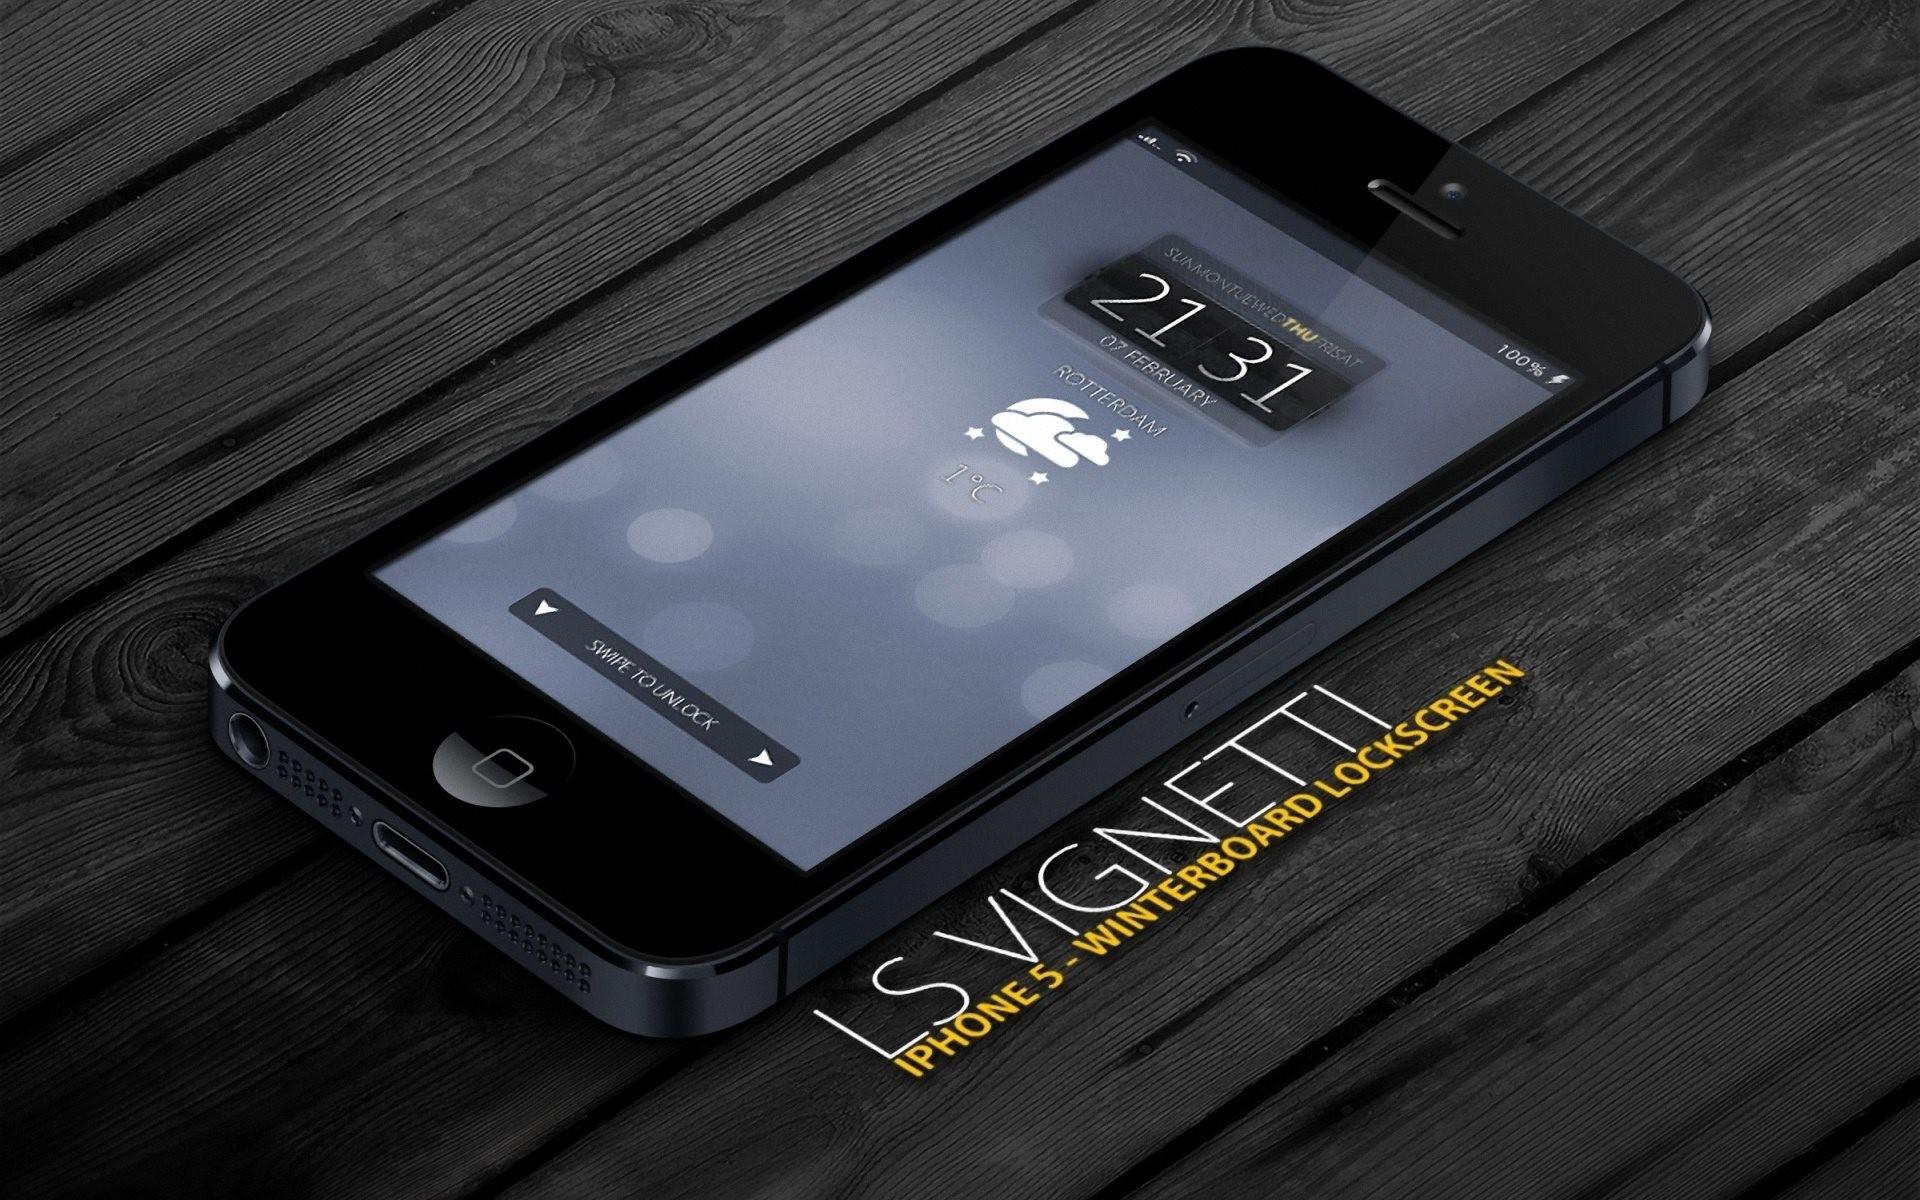 Iphone 5s Wallpapers Hd: IPhone 5S Wallpapers HD (79+ Images